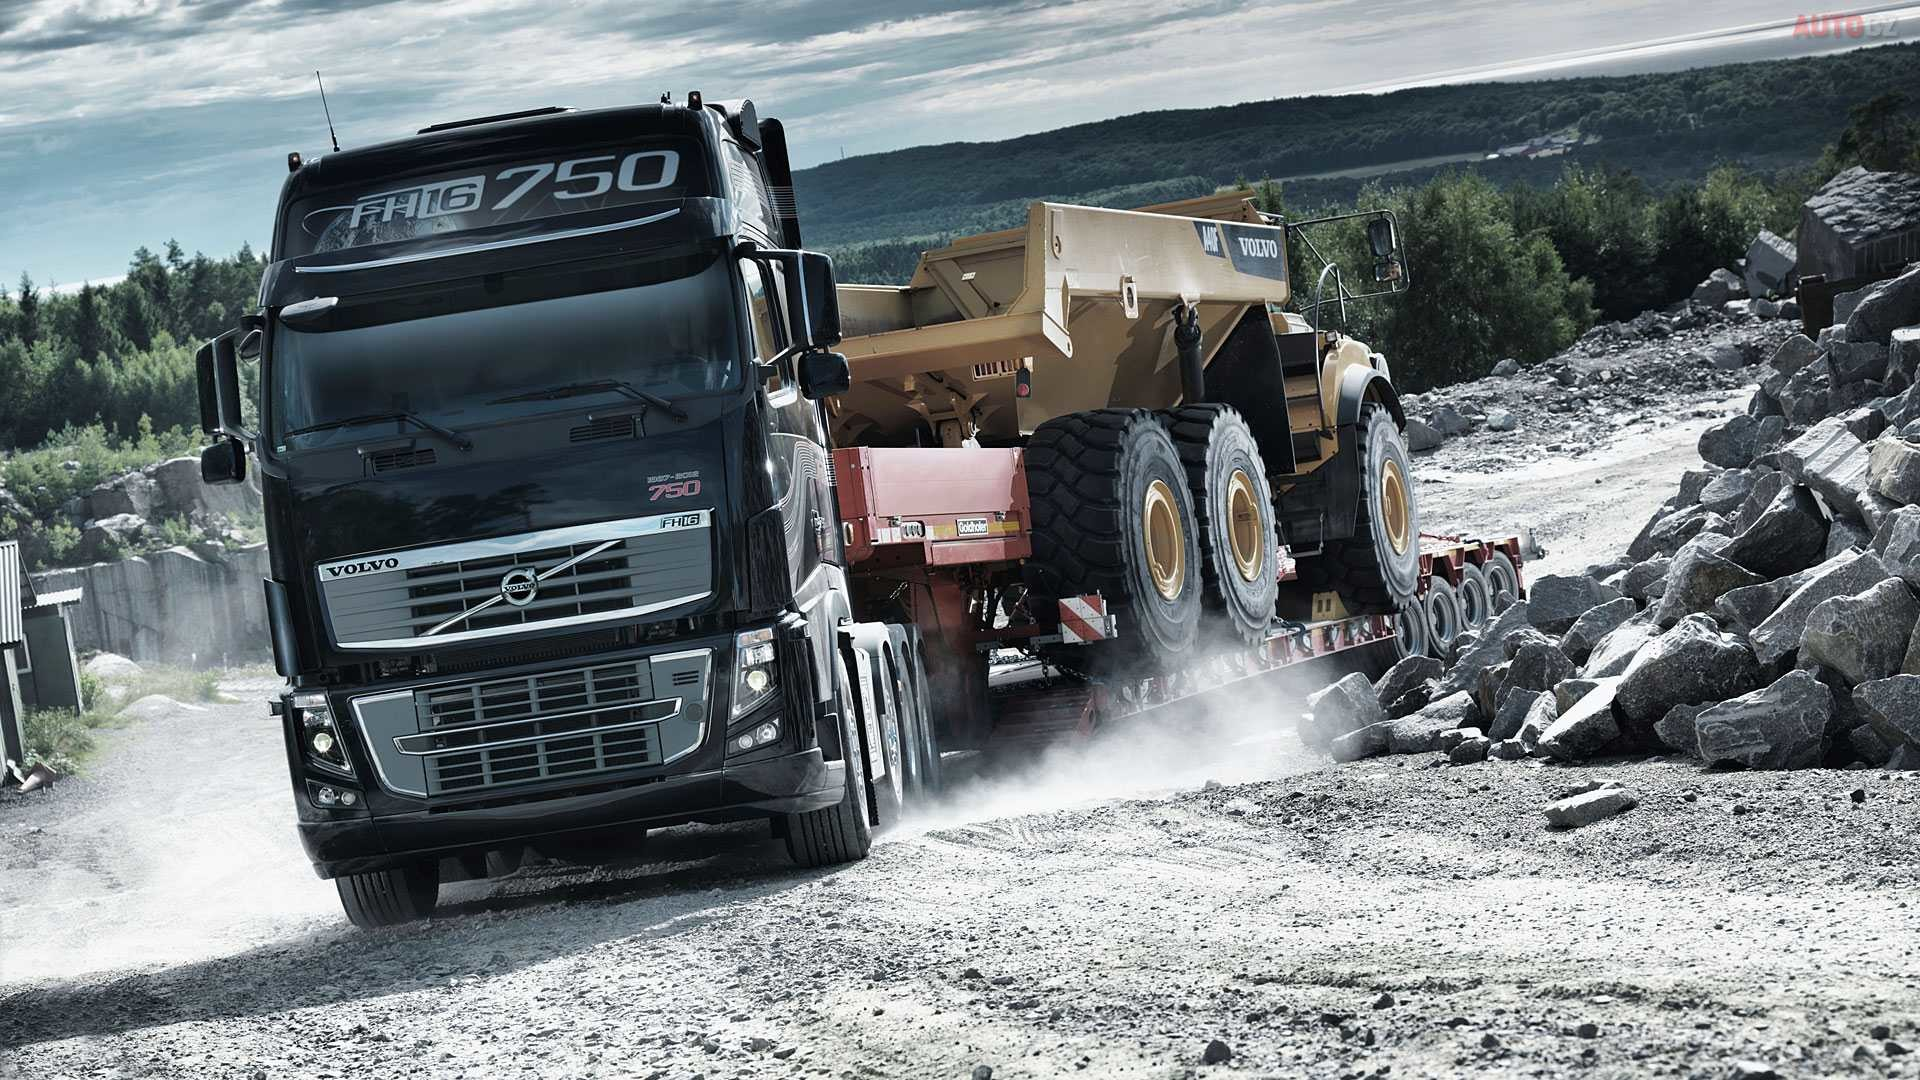 Diesel Truck Wallpaper 43 images